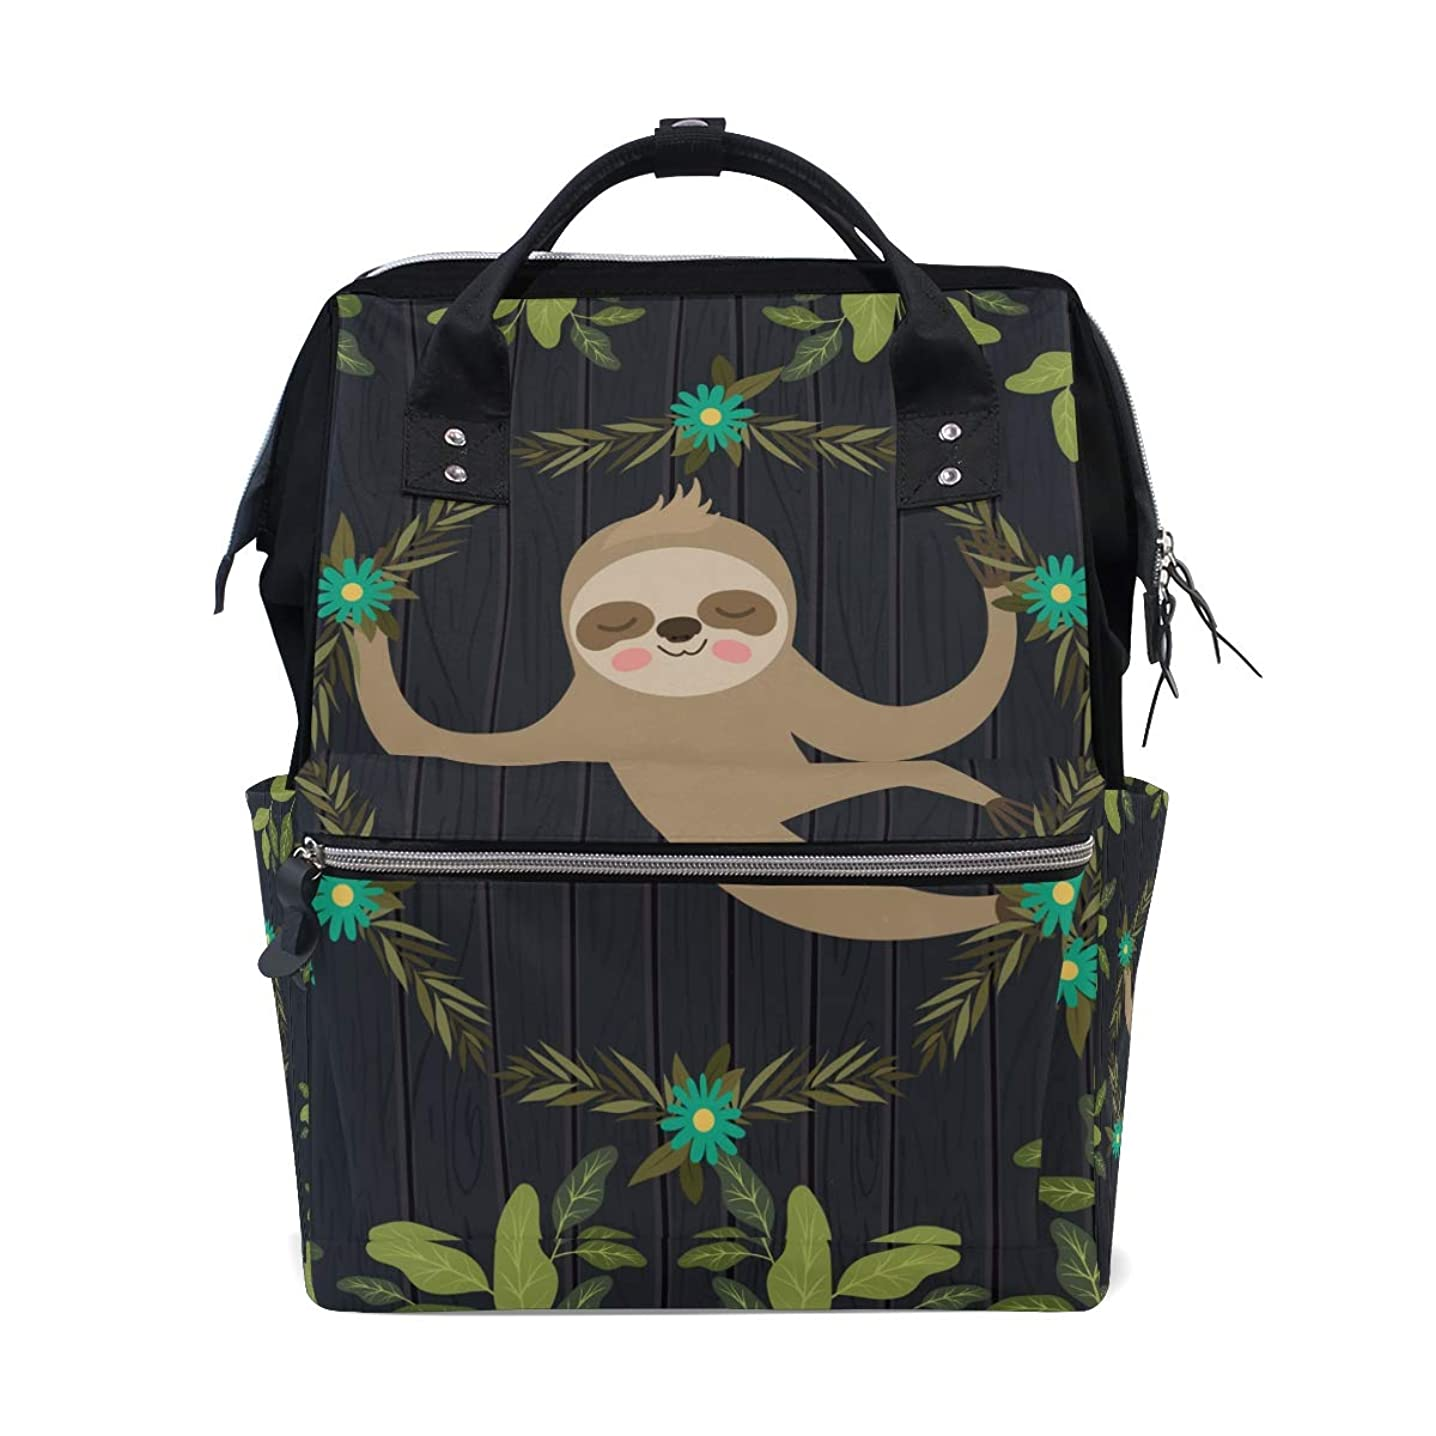 Cute Sloth School Backpack Large Capacity Mummy Bags Laptop Handbag Casual Travel Rucksack Satchel For Women Men Adult Teen Children